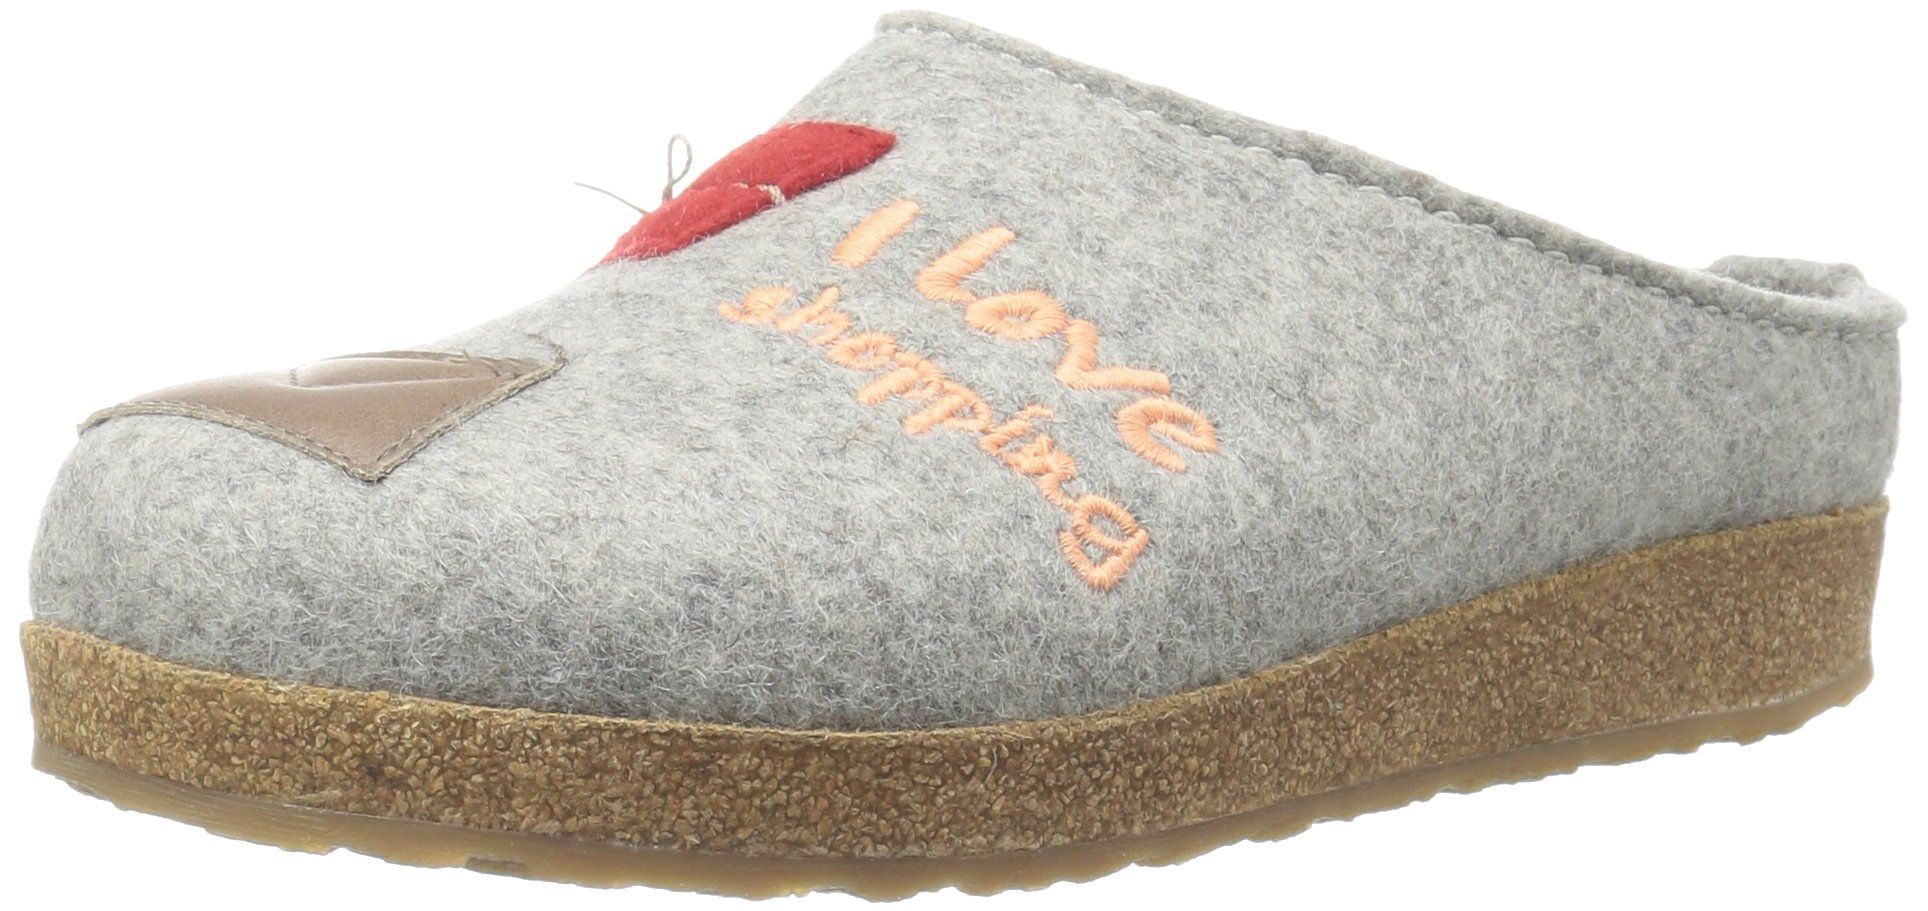 Haflinger Women's Gz Shopping Silver Gr Flat, Silver/Grey, 38 EU/7 M US